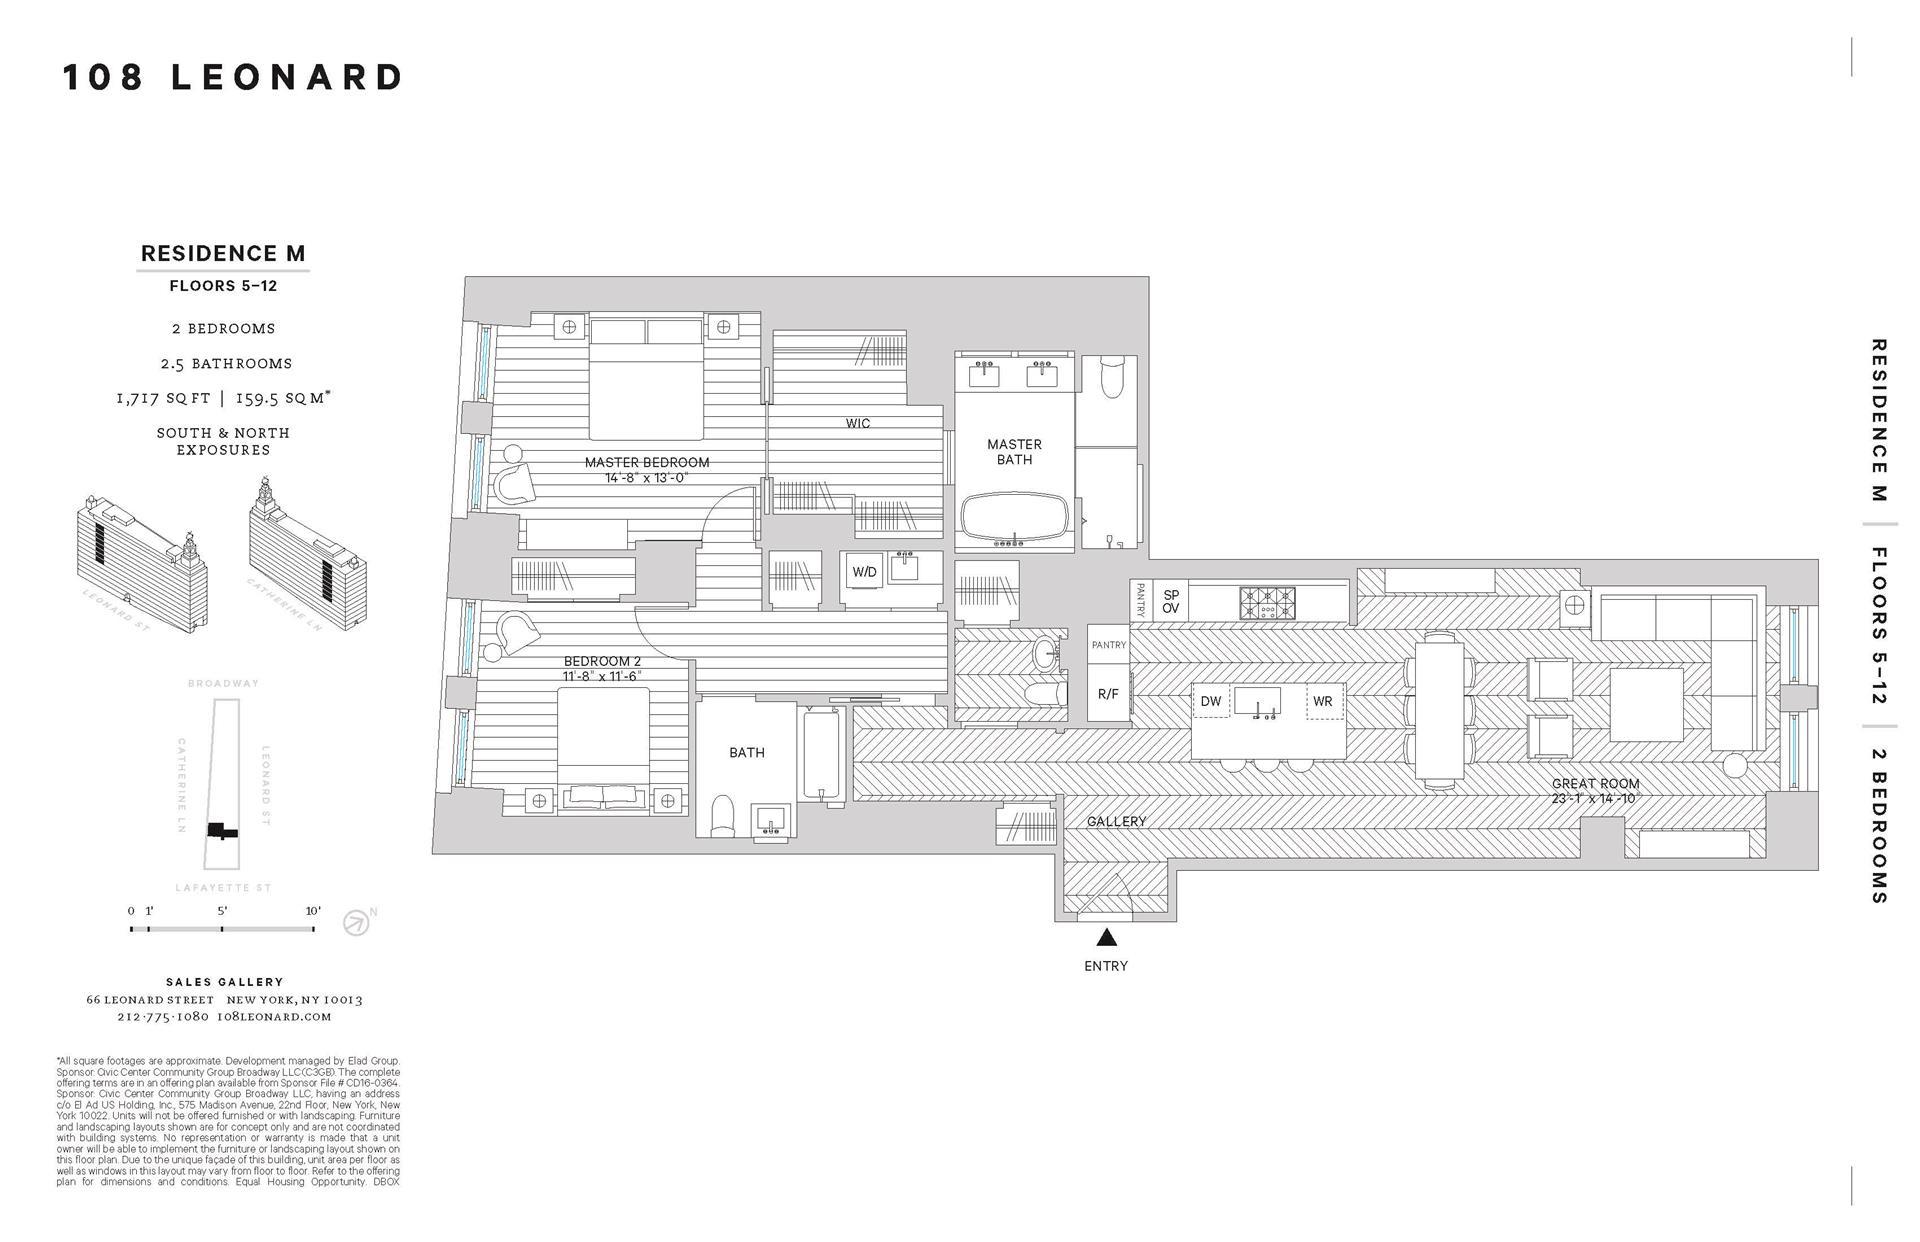 Floor plan of 108 Leonard St, 7M - TriBeCa, New York